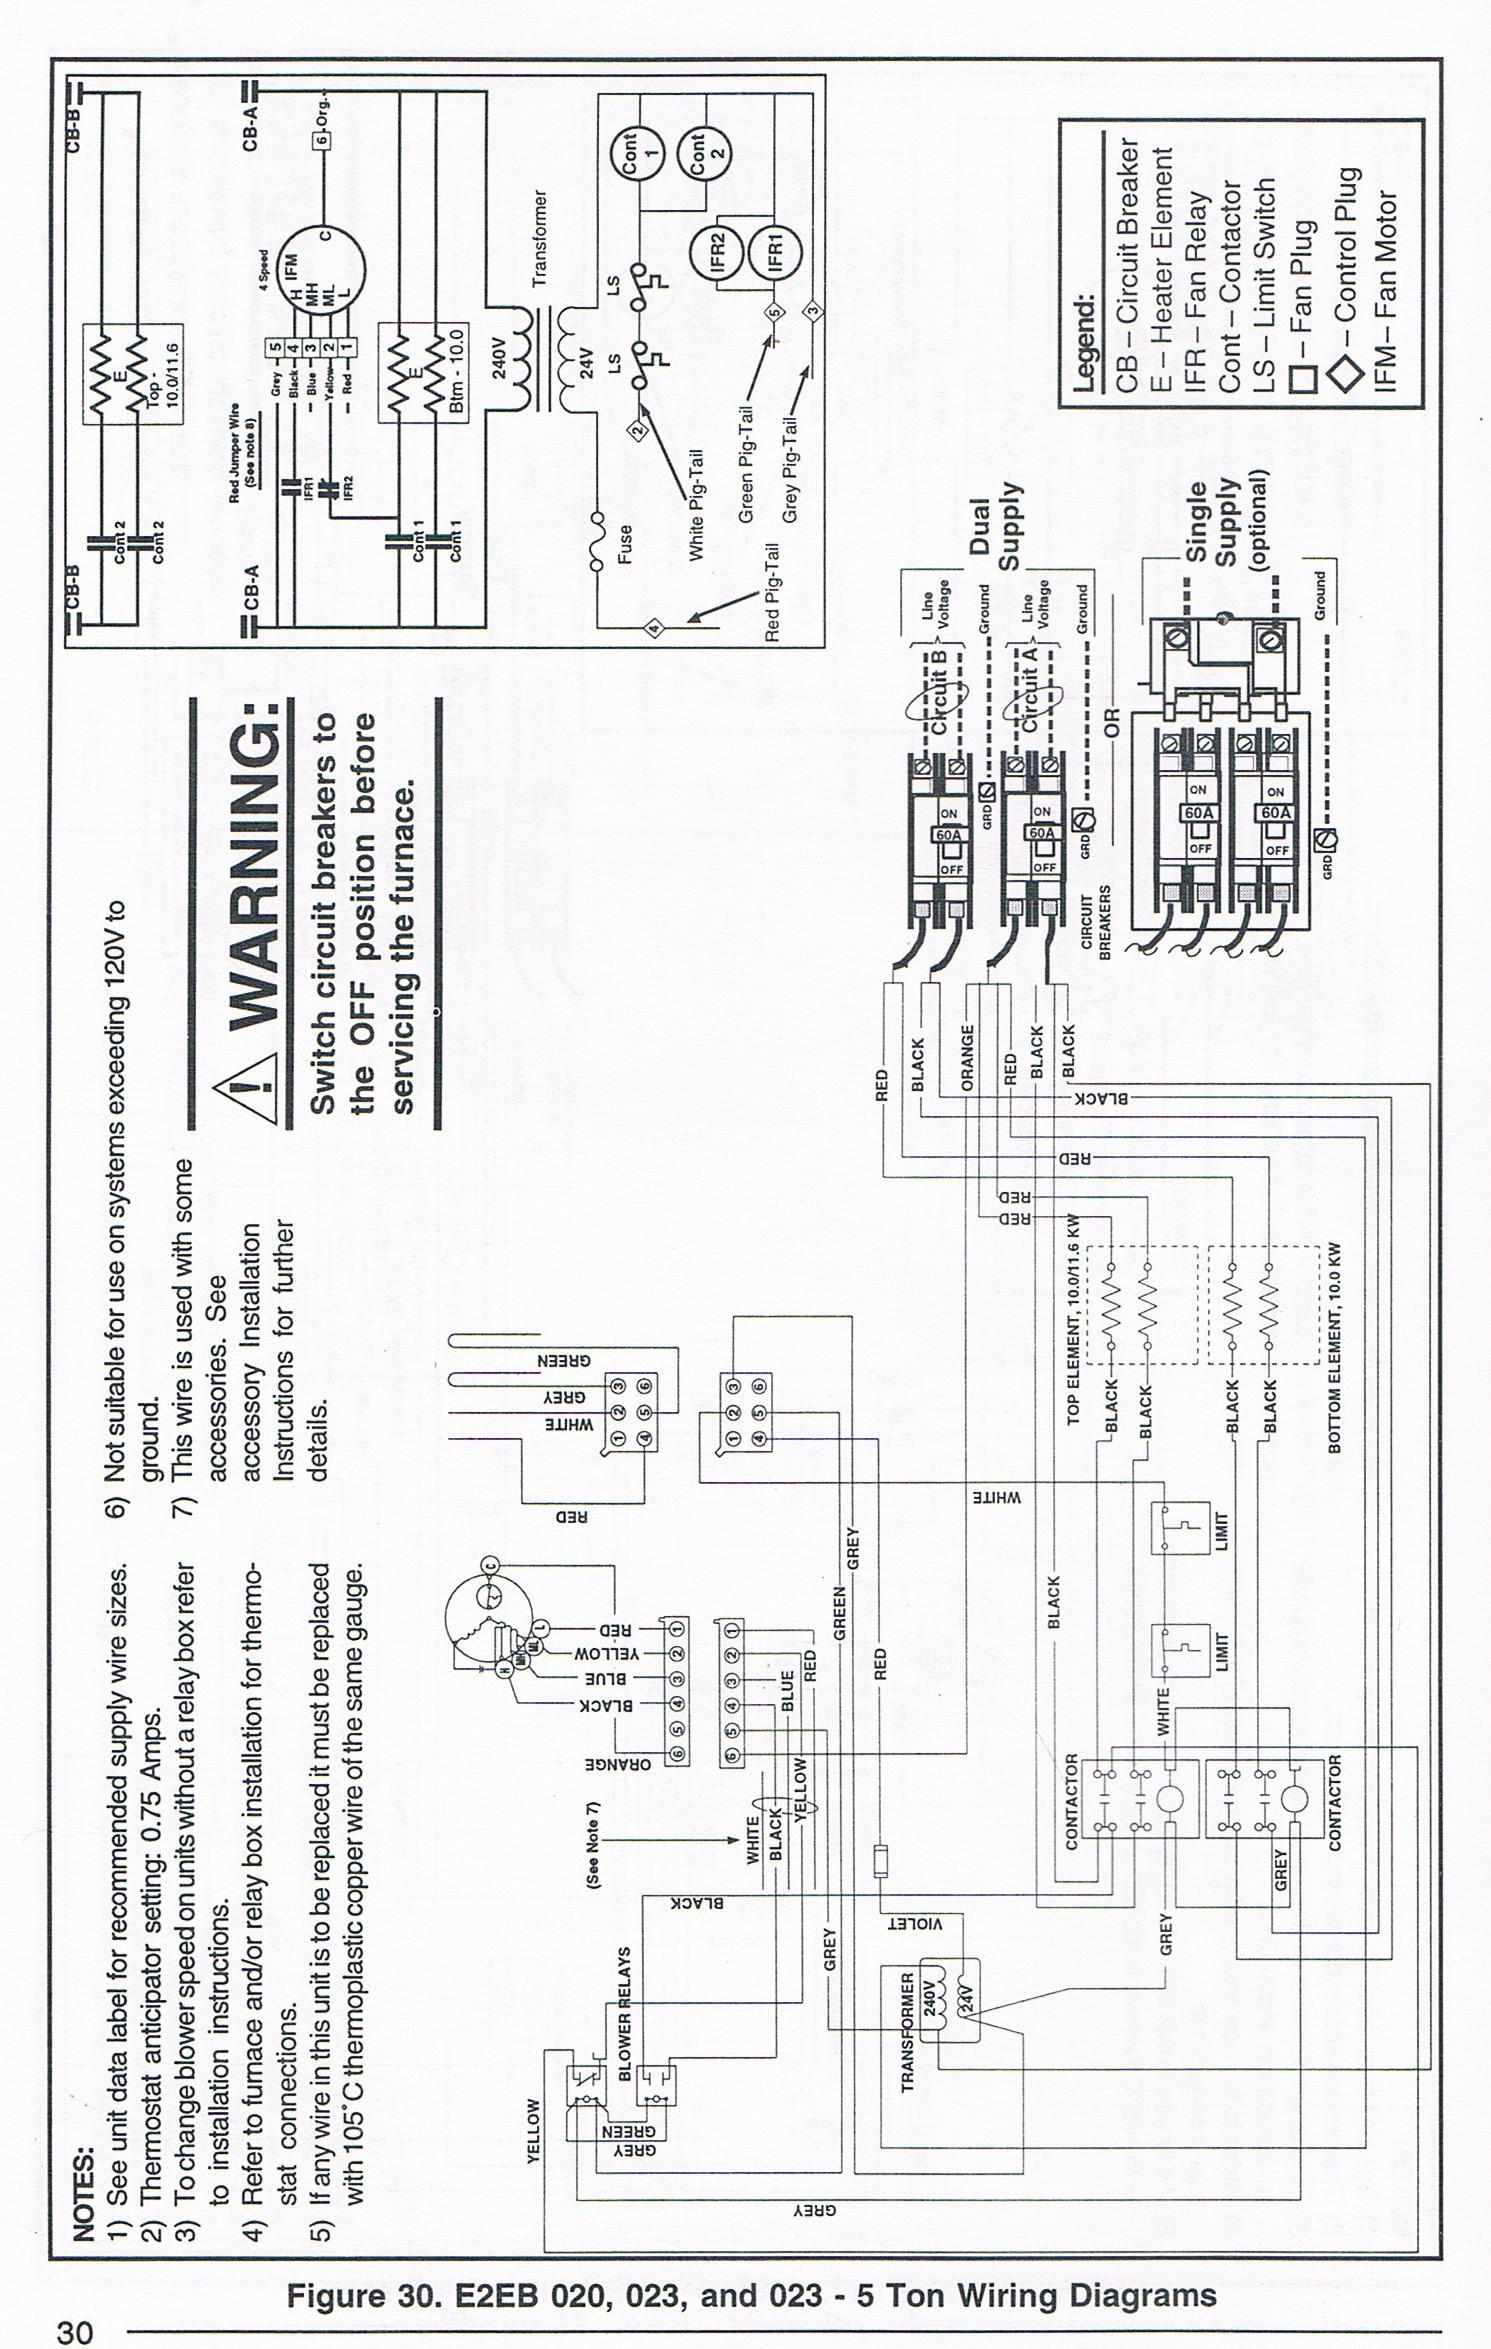 Intertherm Electric Furnace Wiring Diagram Lovely nordyne Air Handler Wiring Diagram Wiring Diagrams